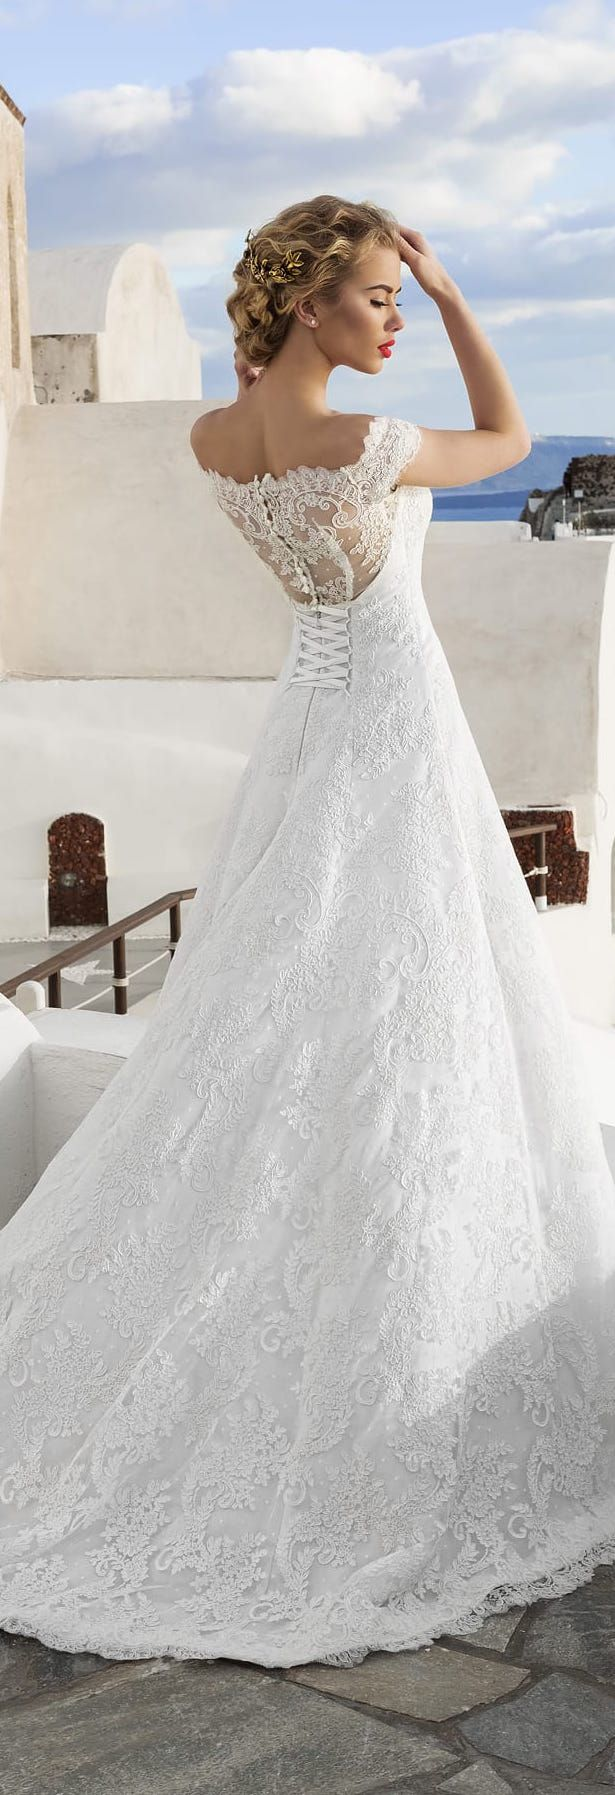 Wedding-Dresses-0571